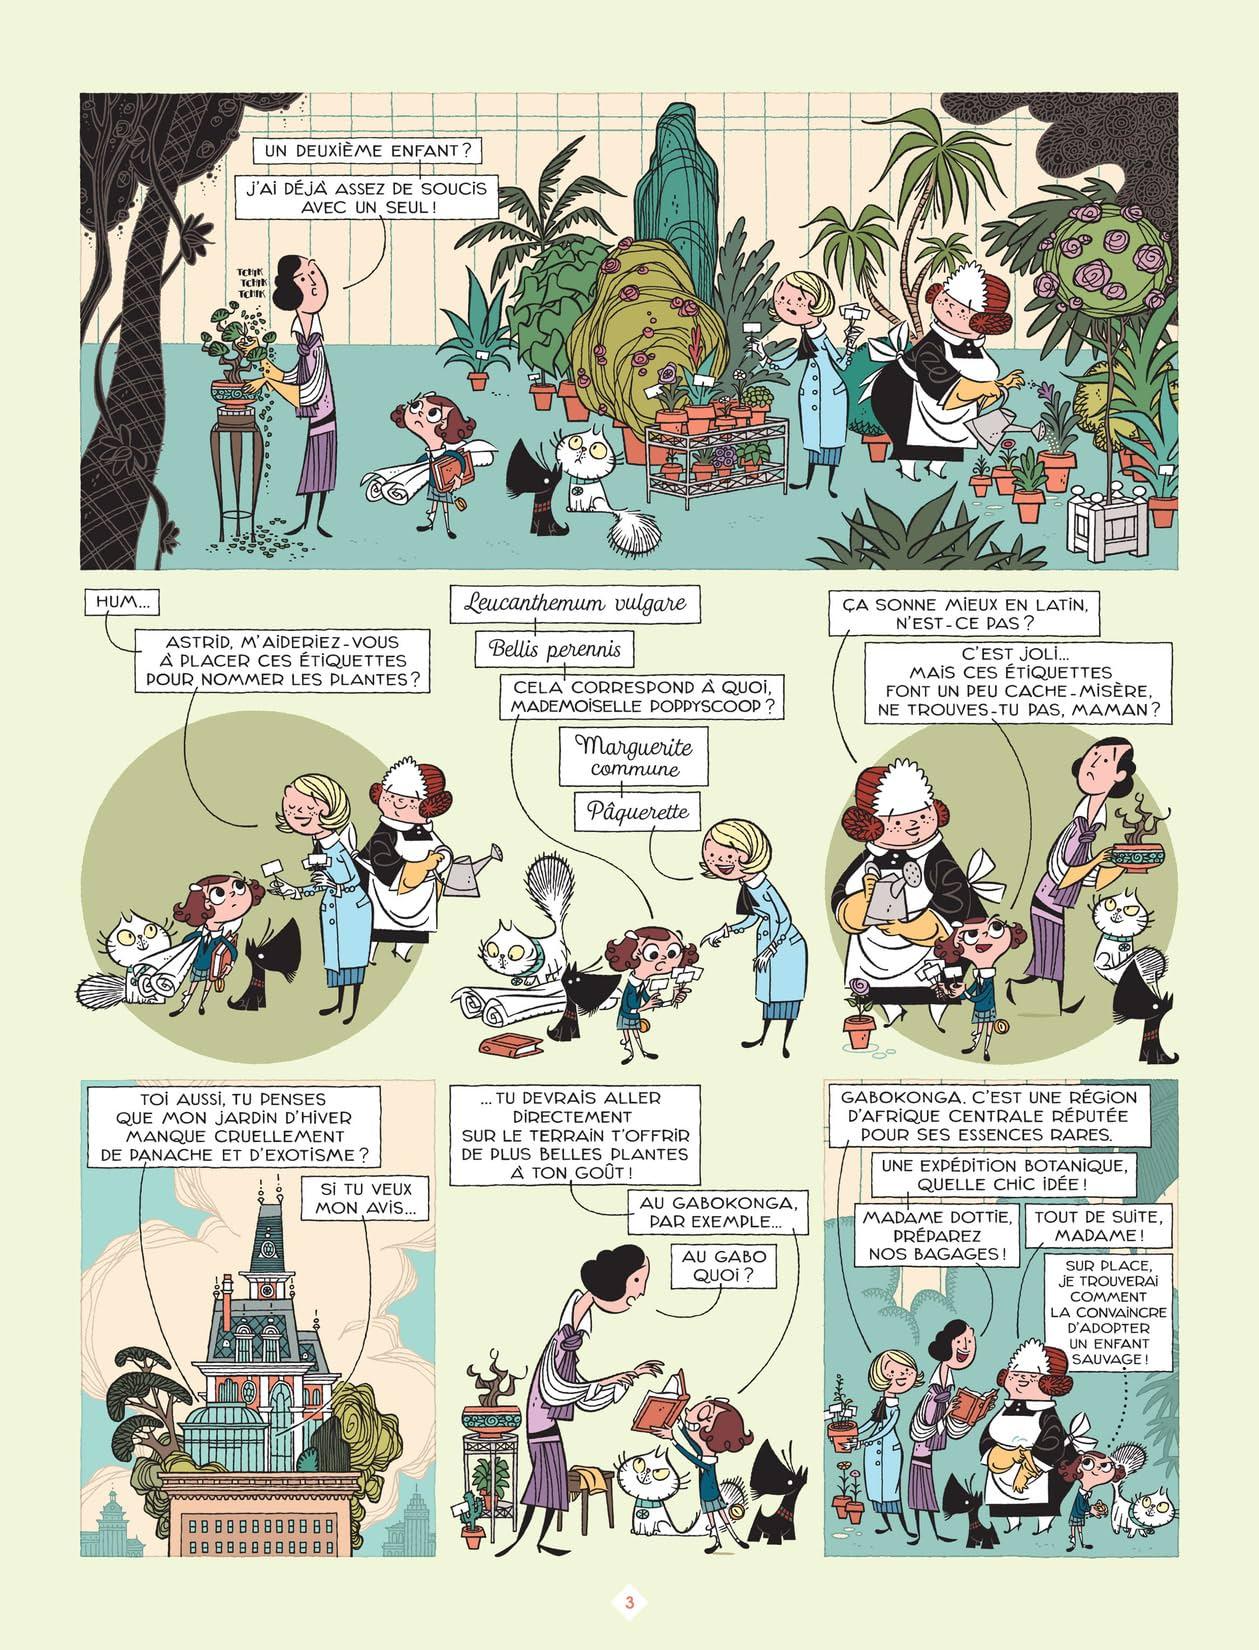 Astrid Bromure Vol. 3: Comment épingler l'enfant sauvage